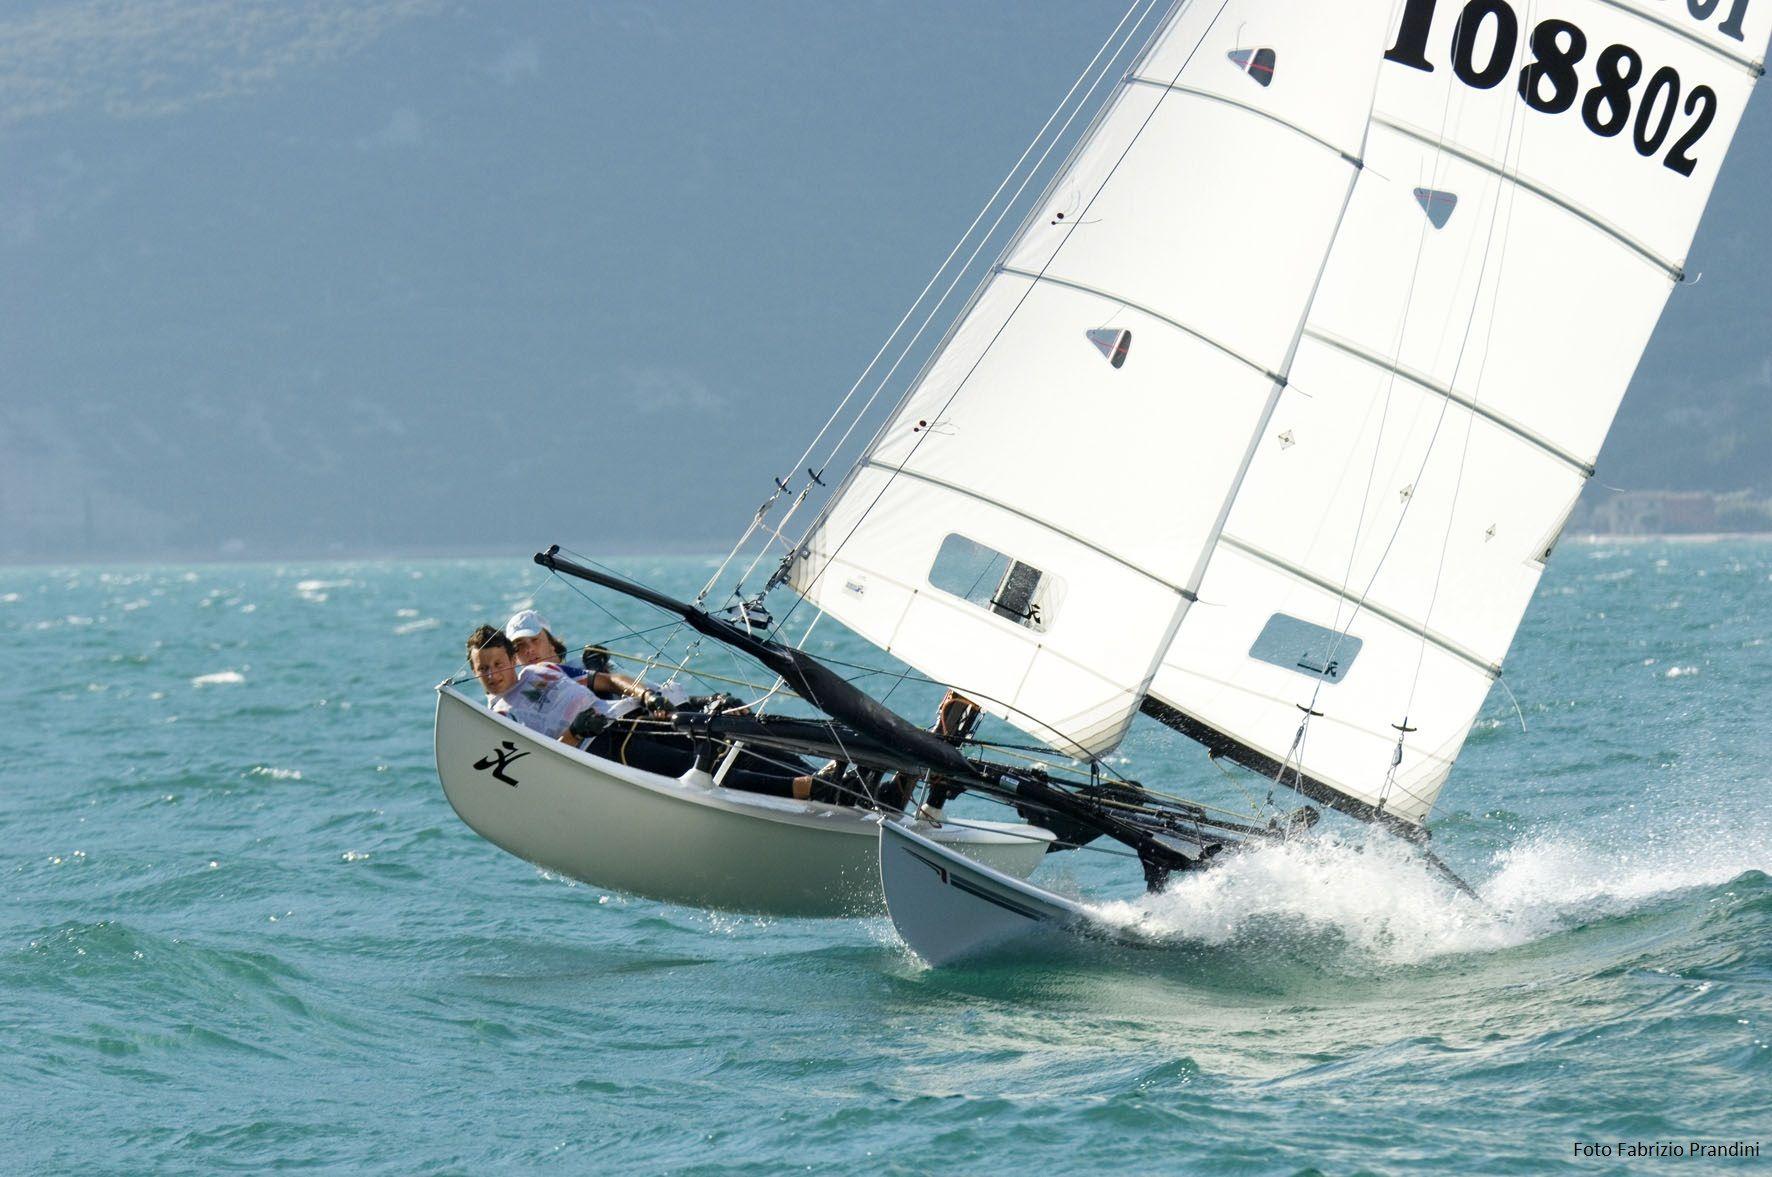 ...speed !! Catamaran, Boat, Sailing